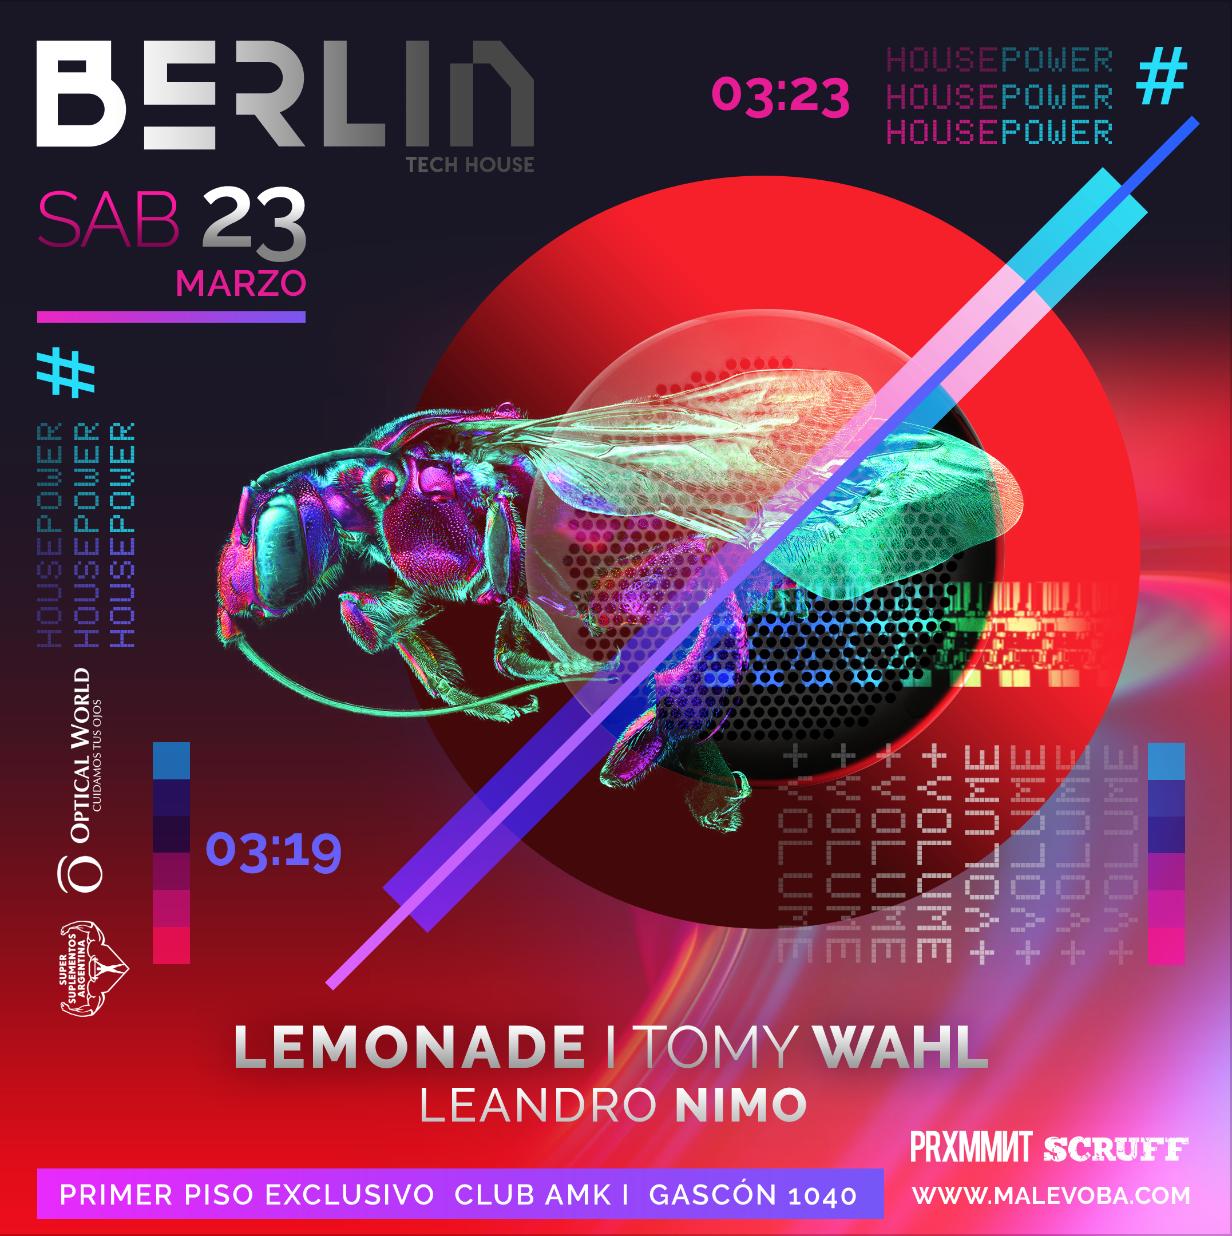 BERLIN IV 23 MARZ